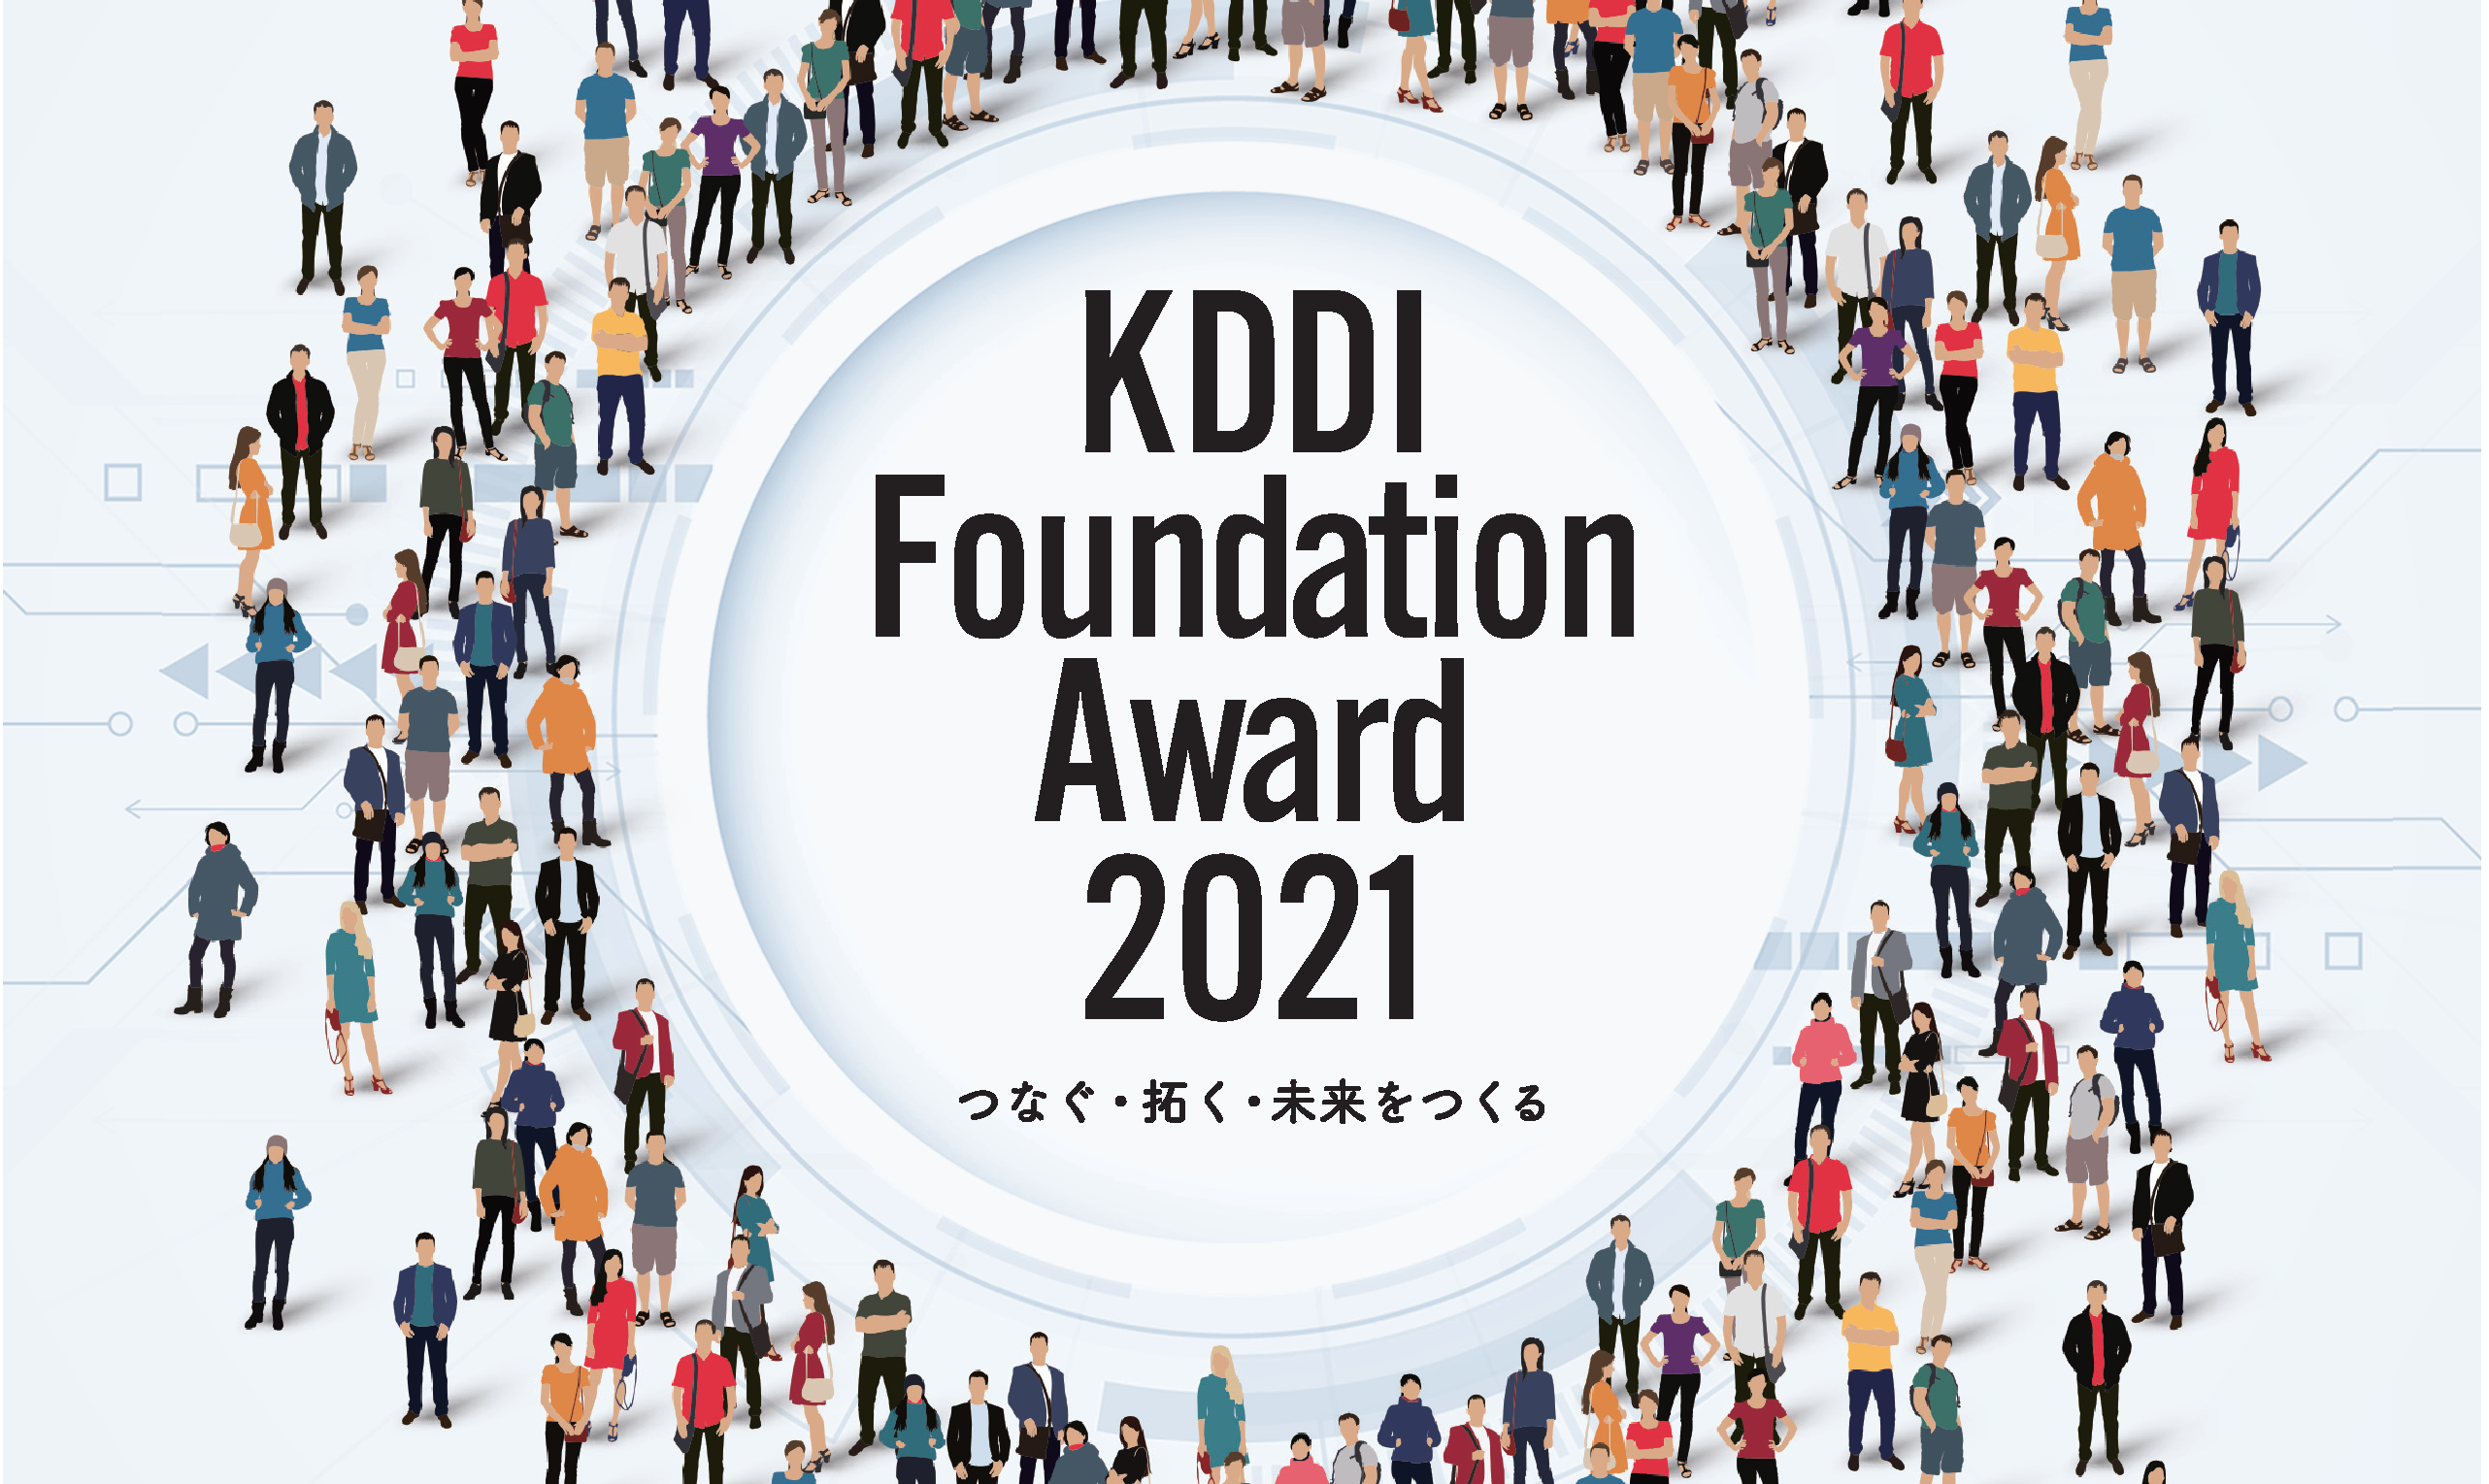 「KDDI Foundation Award 2021」受賞者の決定について